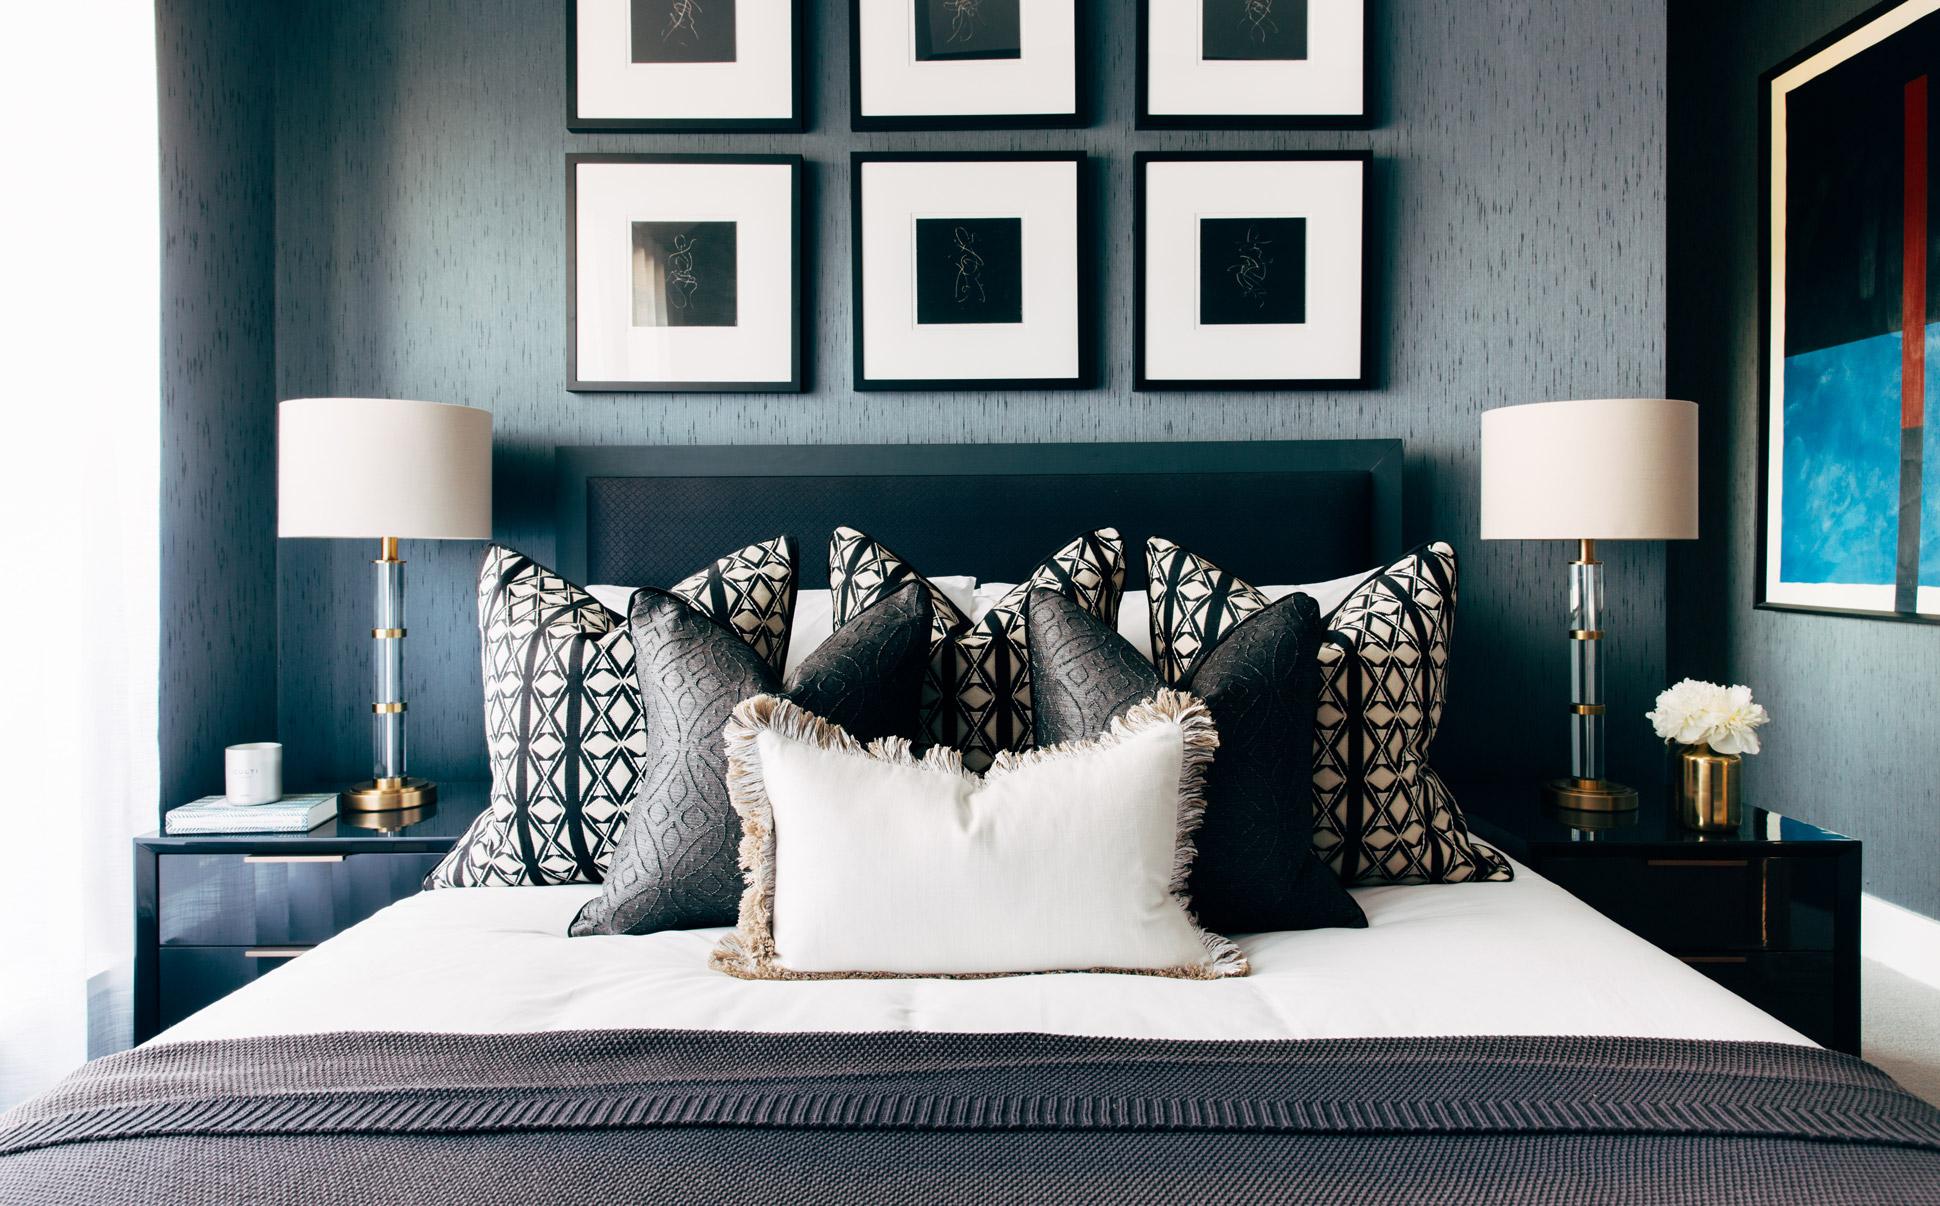 A_LONDON_Hamilton_Court_2_11_Bedroom.jpg